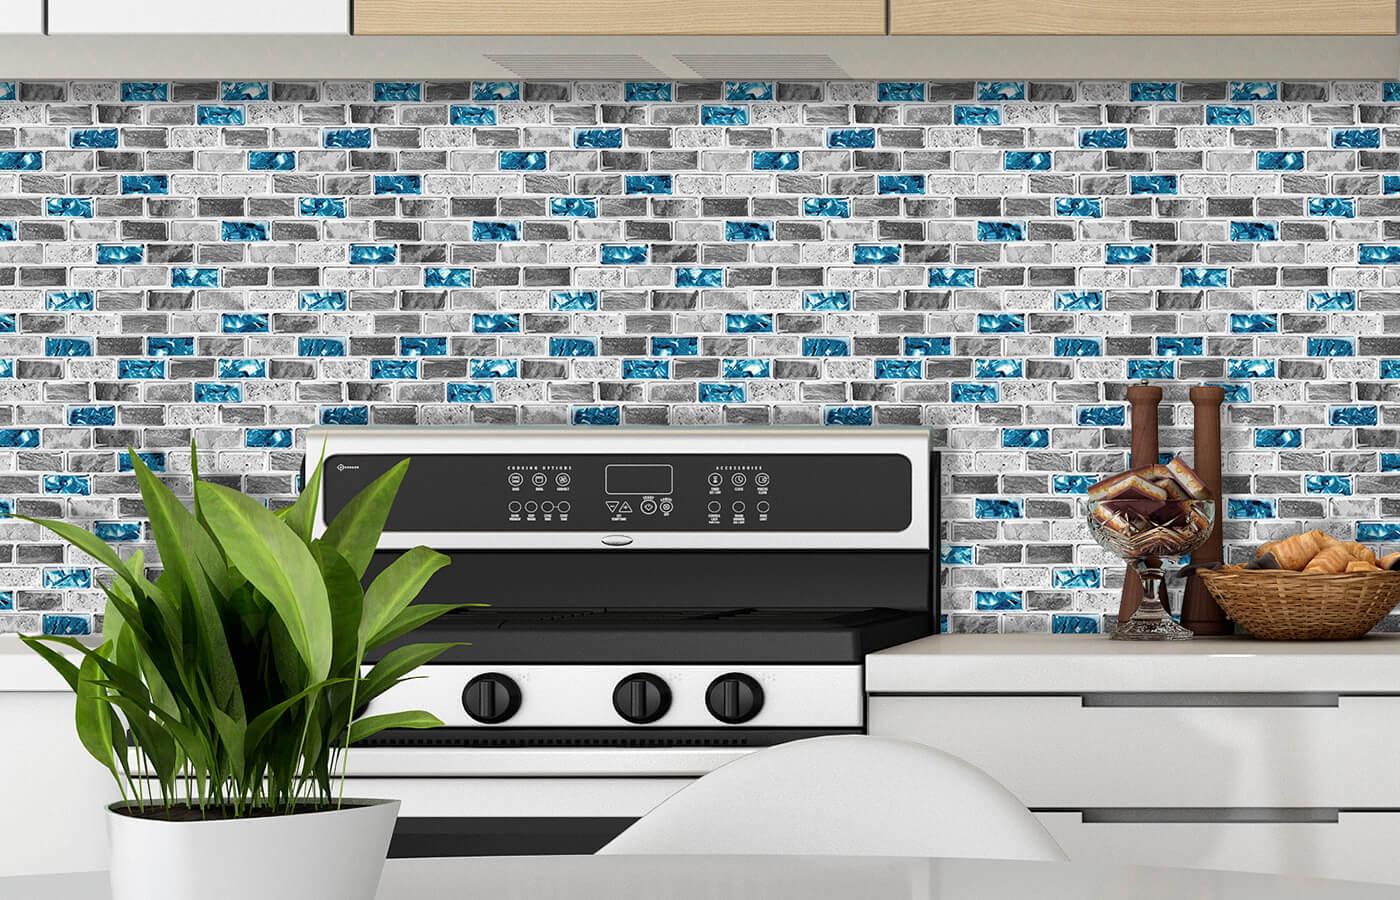 decorative glass and stone look vinyl tile for kitchen backspalsh